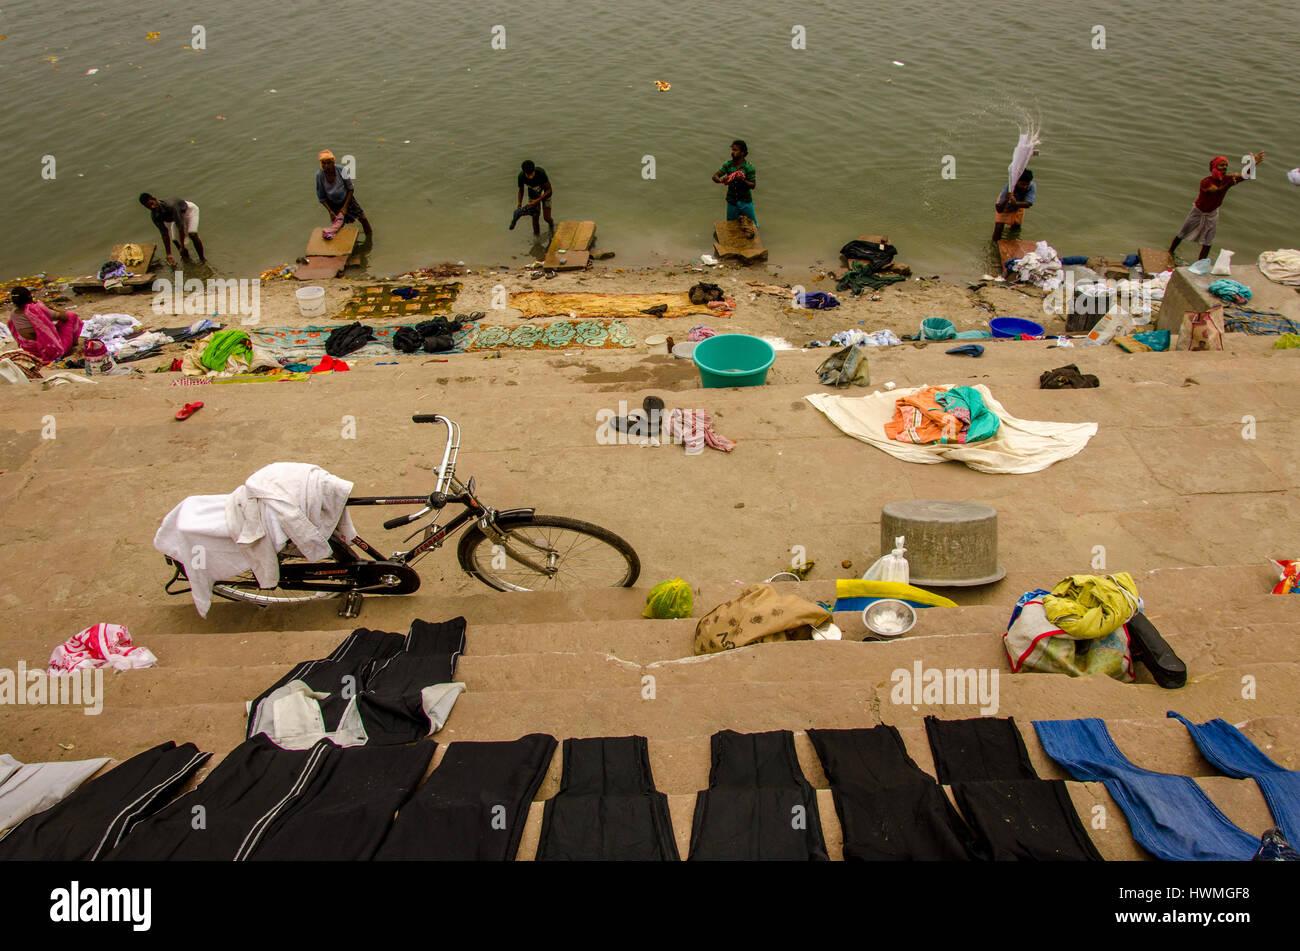 Laundry In Varanasi, Varanasi, India - Stock Image